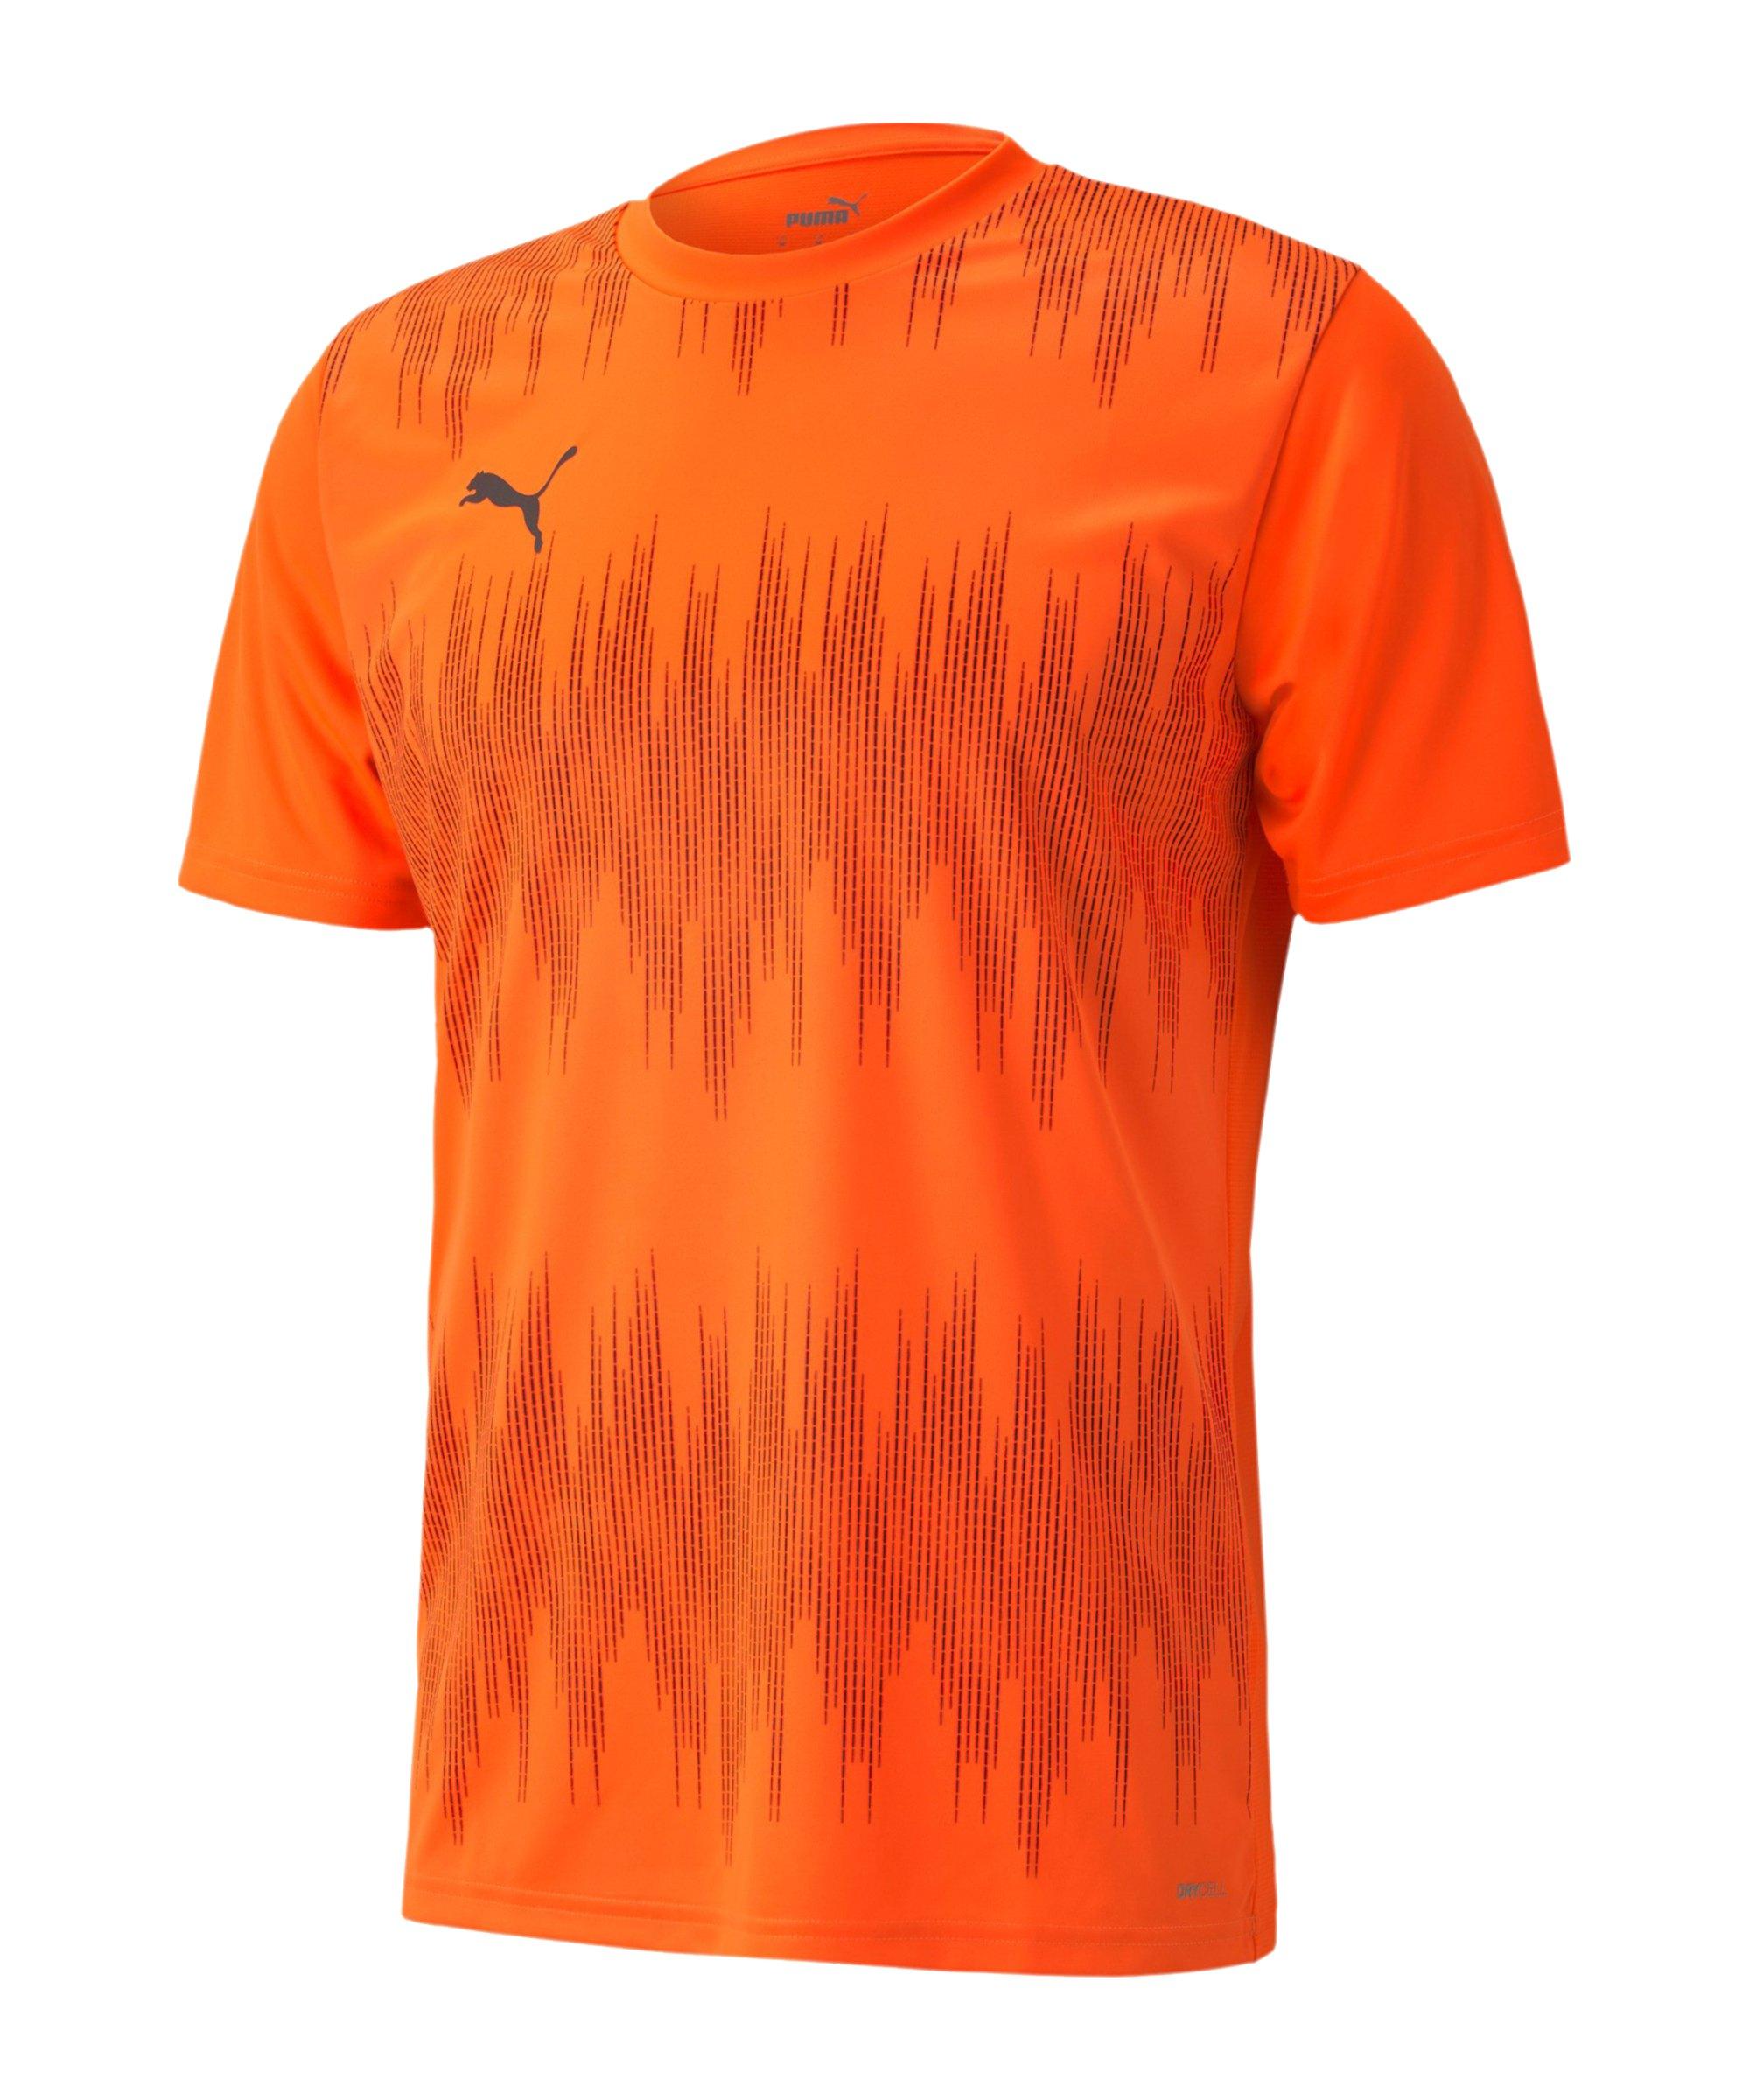 PUMA ftblNXT Graphic Core T-Shirt Orange F02 - orange